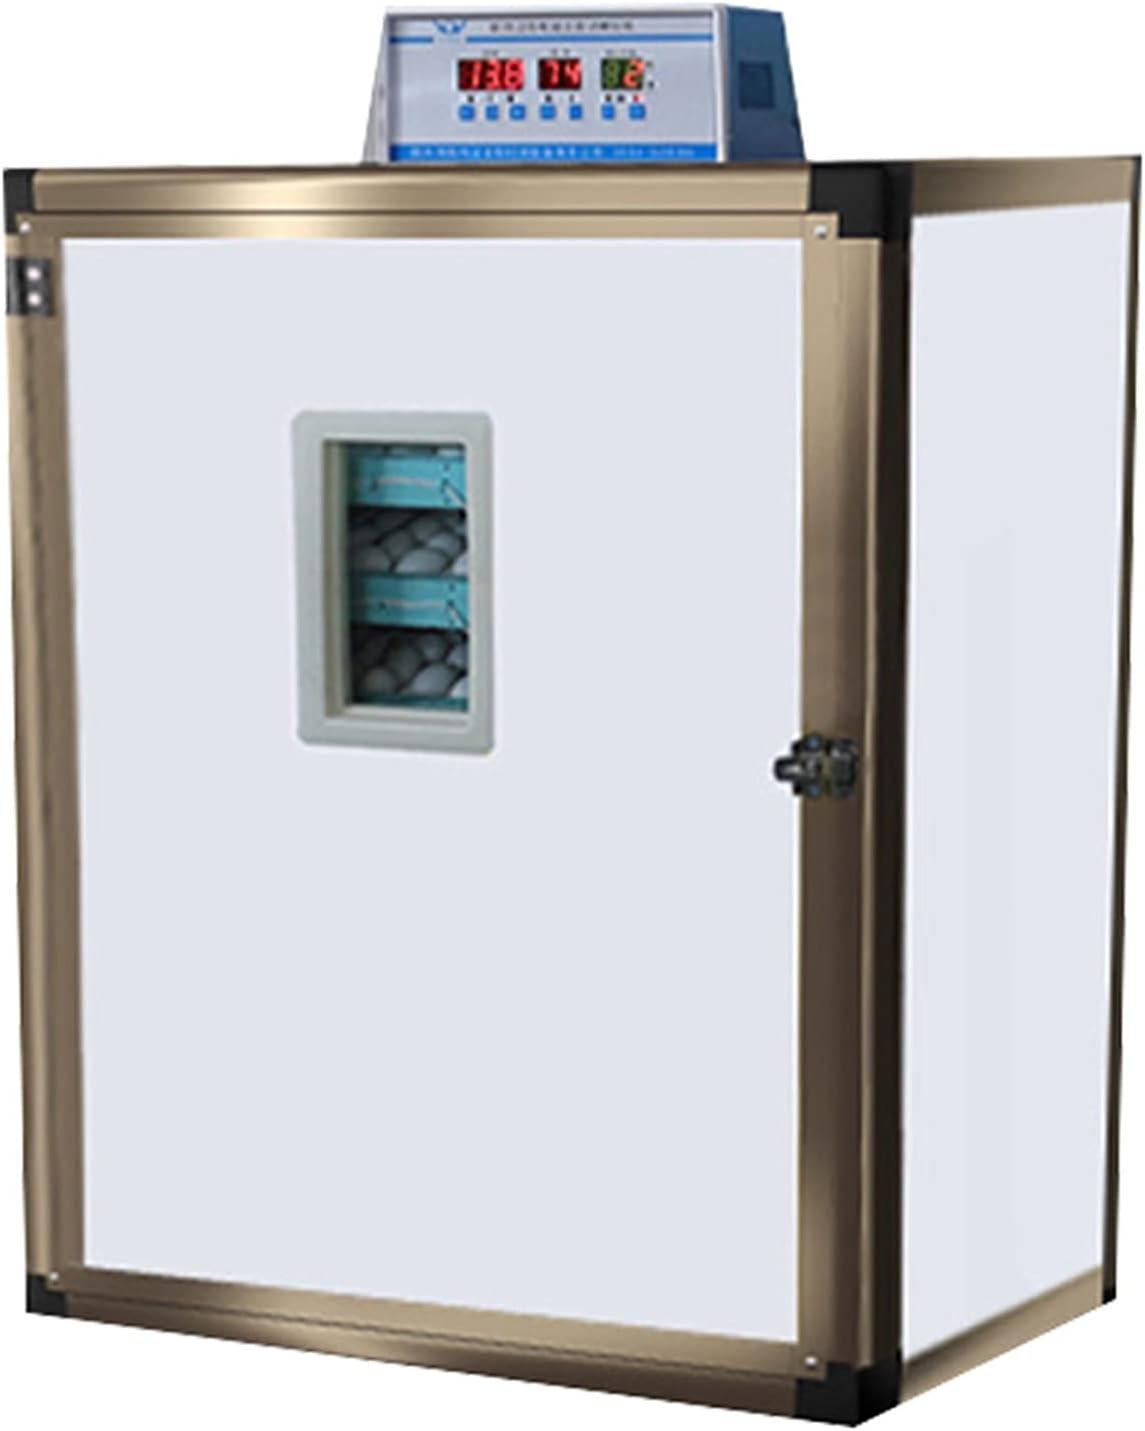 YAWEDA Large Egg Incubator Automatic Humidity Temperature Contro 4 years Memphis Mall warranty